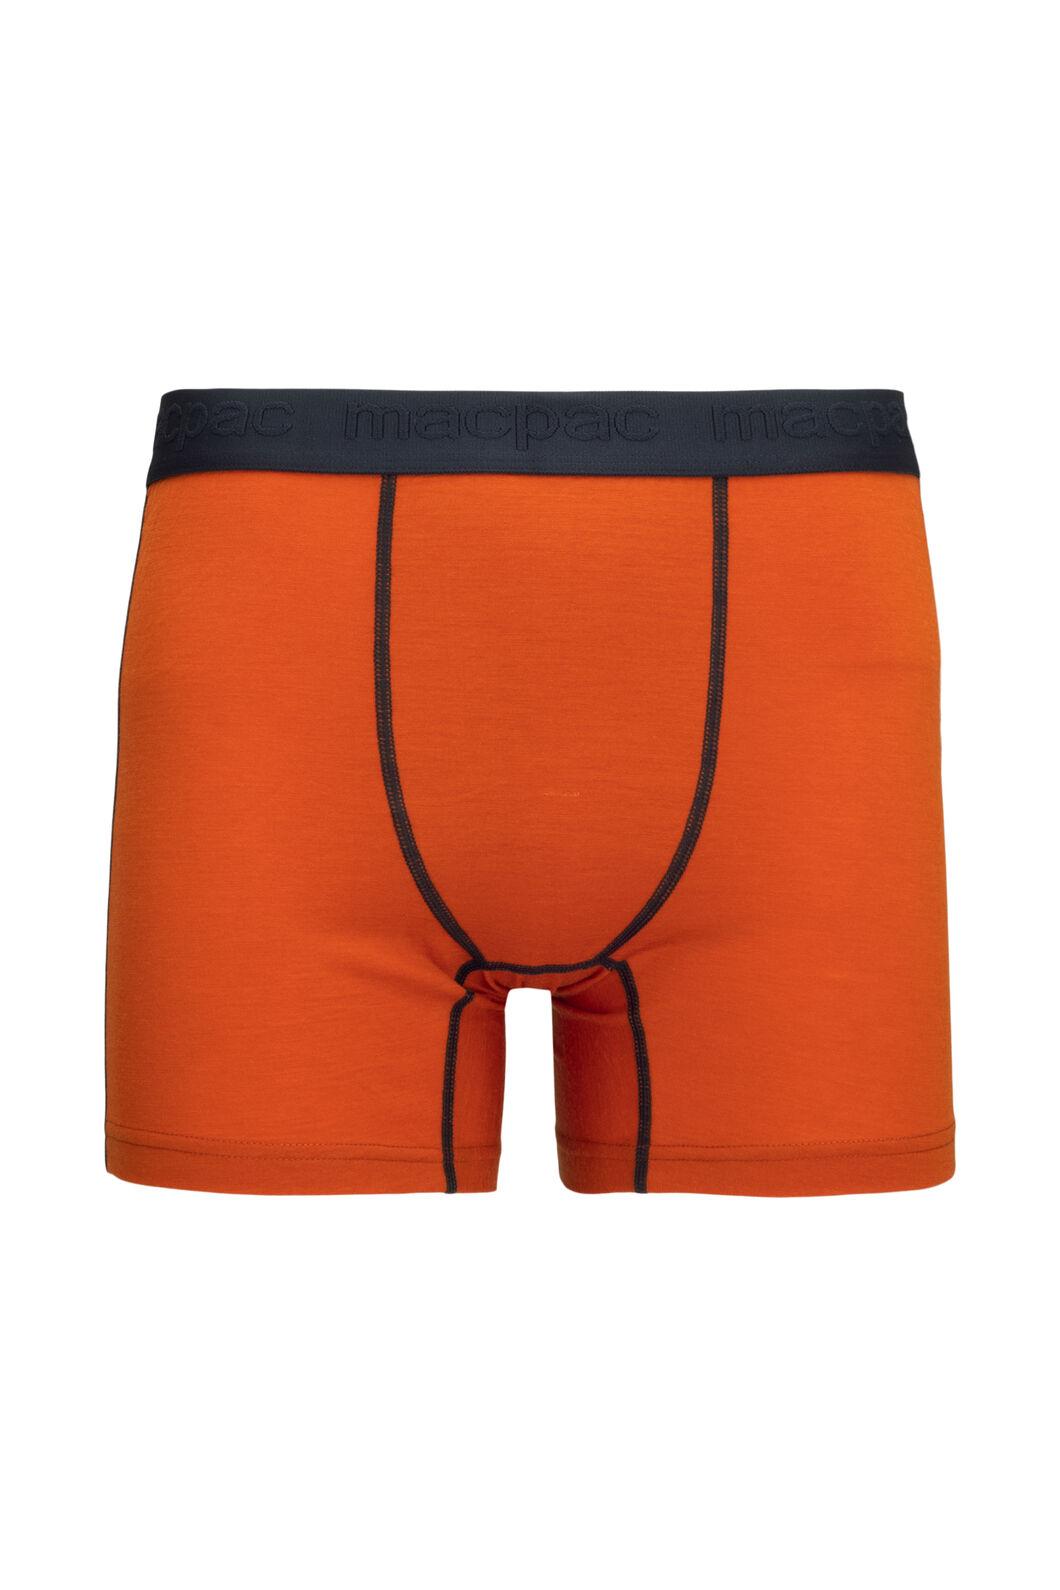 Macpac Men's 180 Merino Boxers, Orange Flame, hi-res